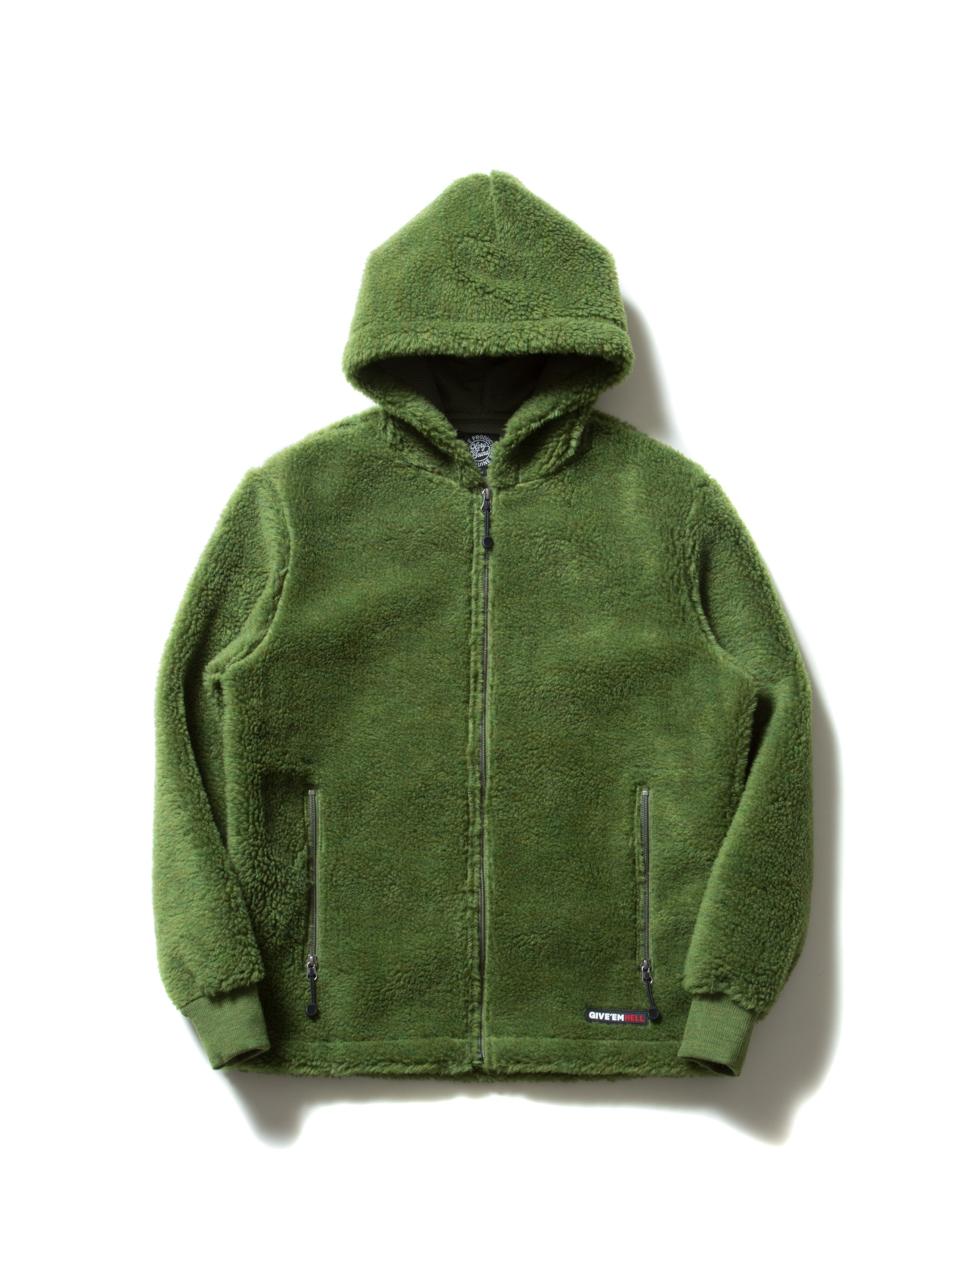 Death Bowl Zip Parka-Green-